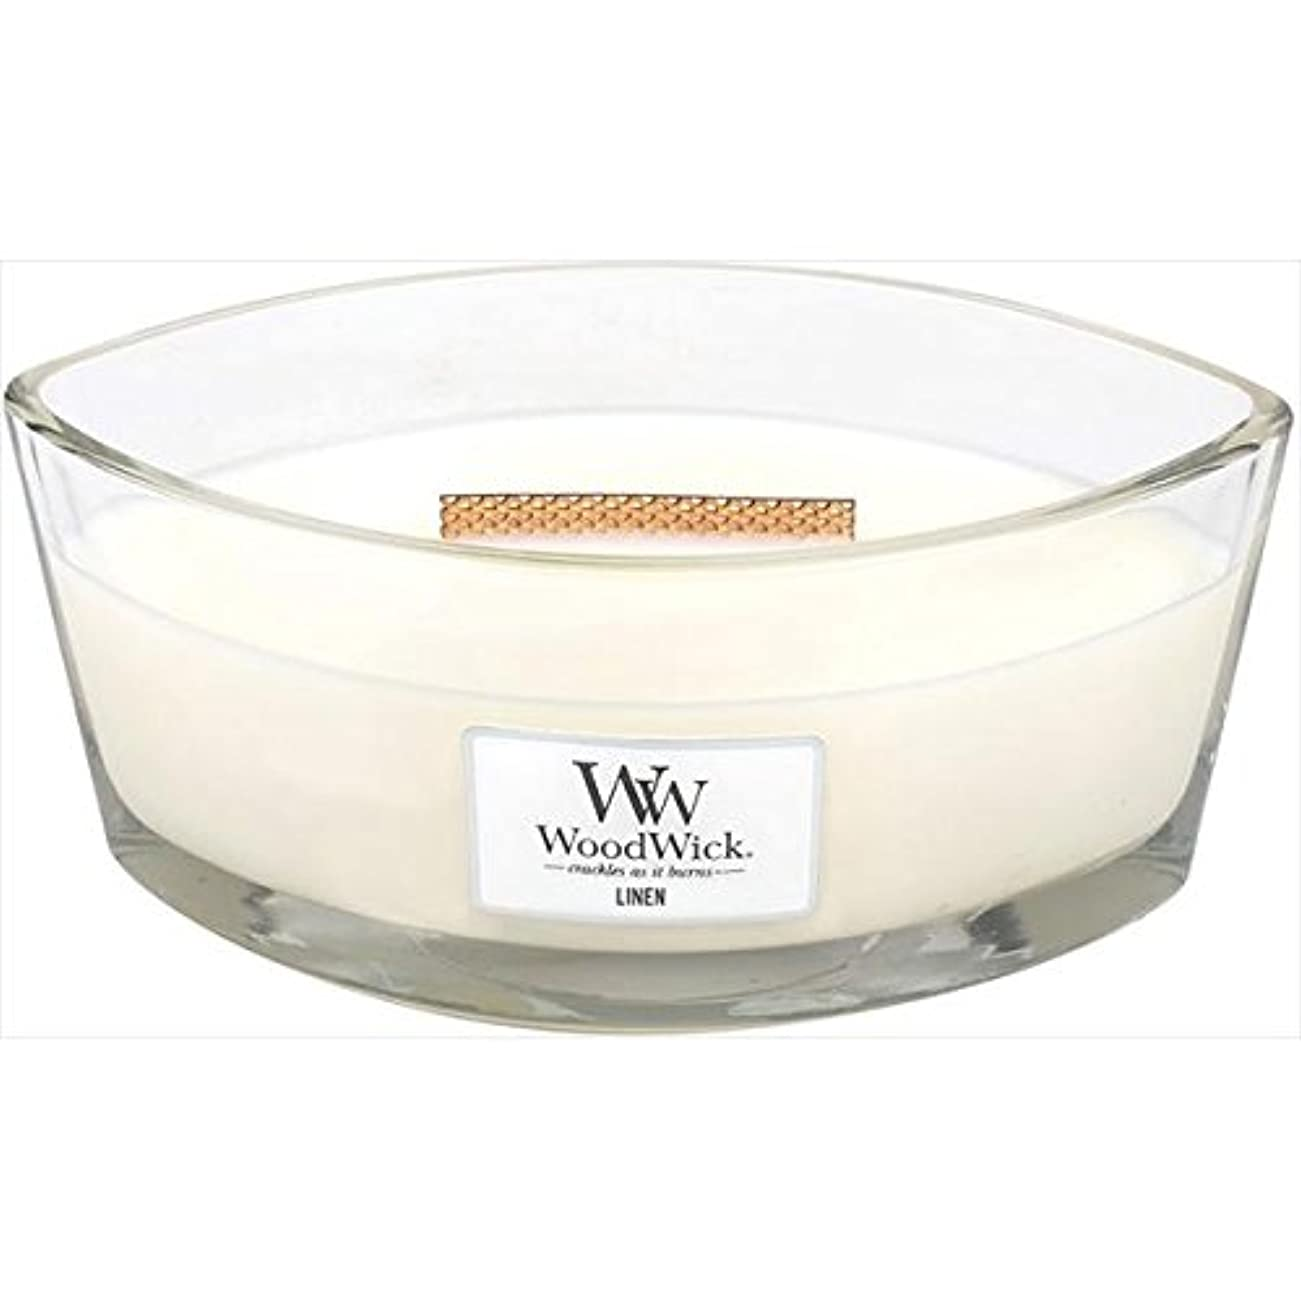 Wood Wick(ウッドウィック):ハースウィックL リネン WW940053012